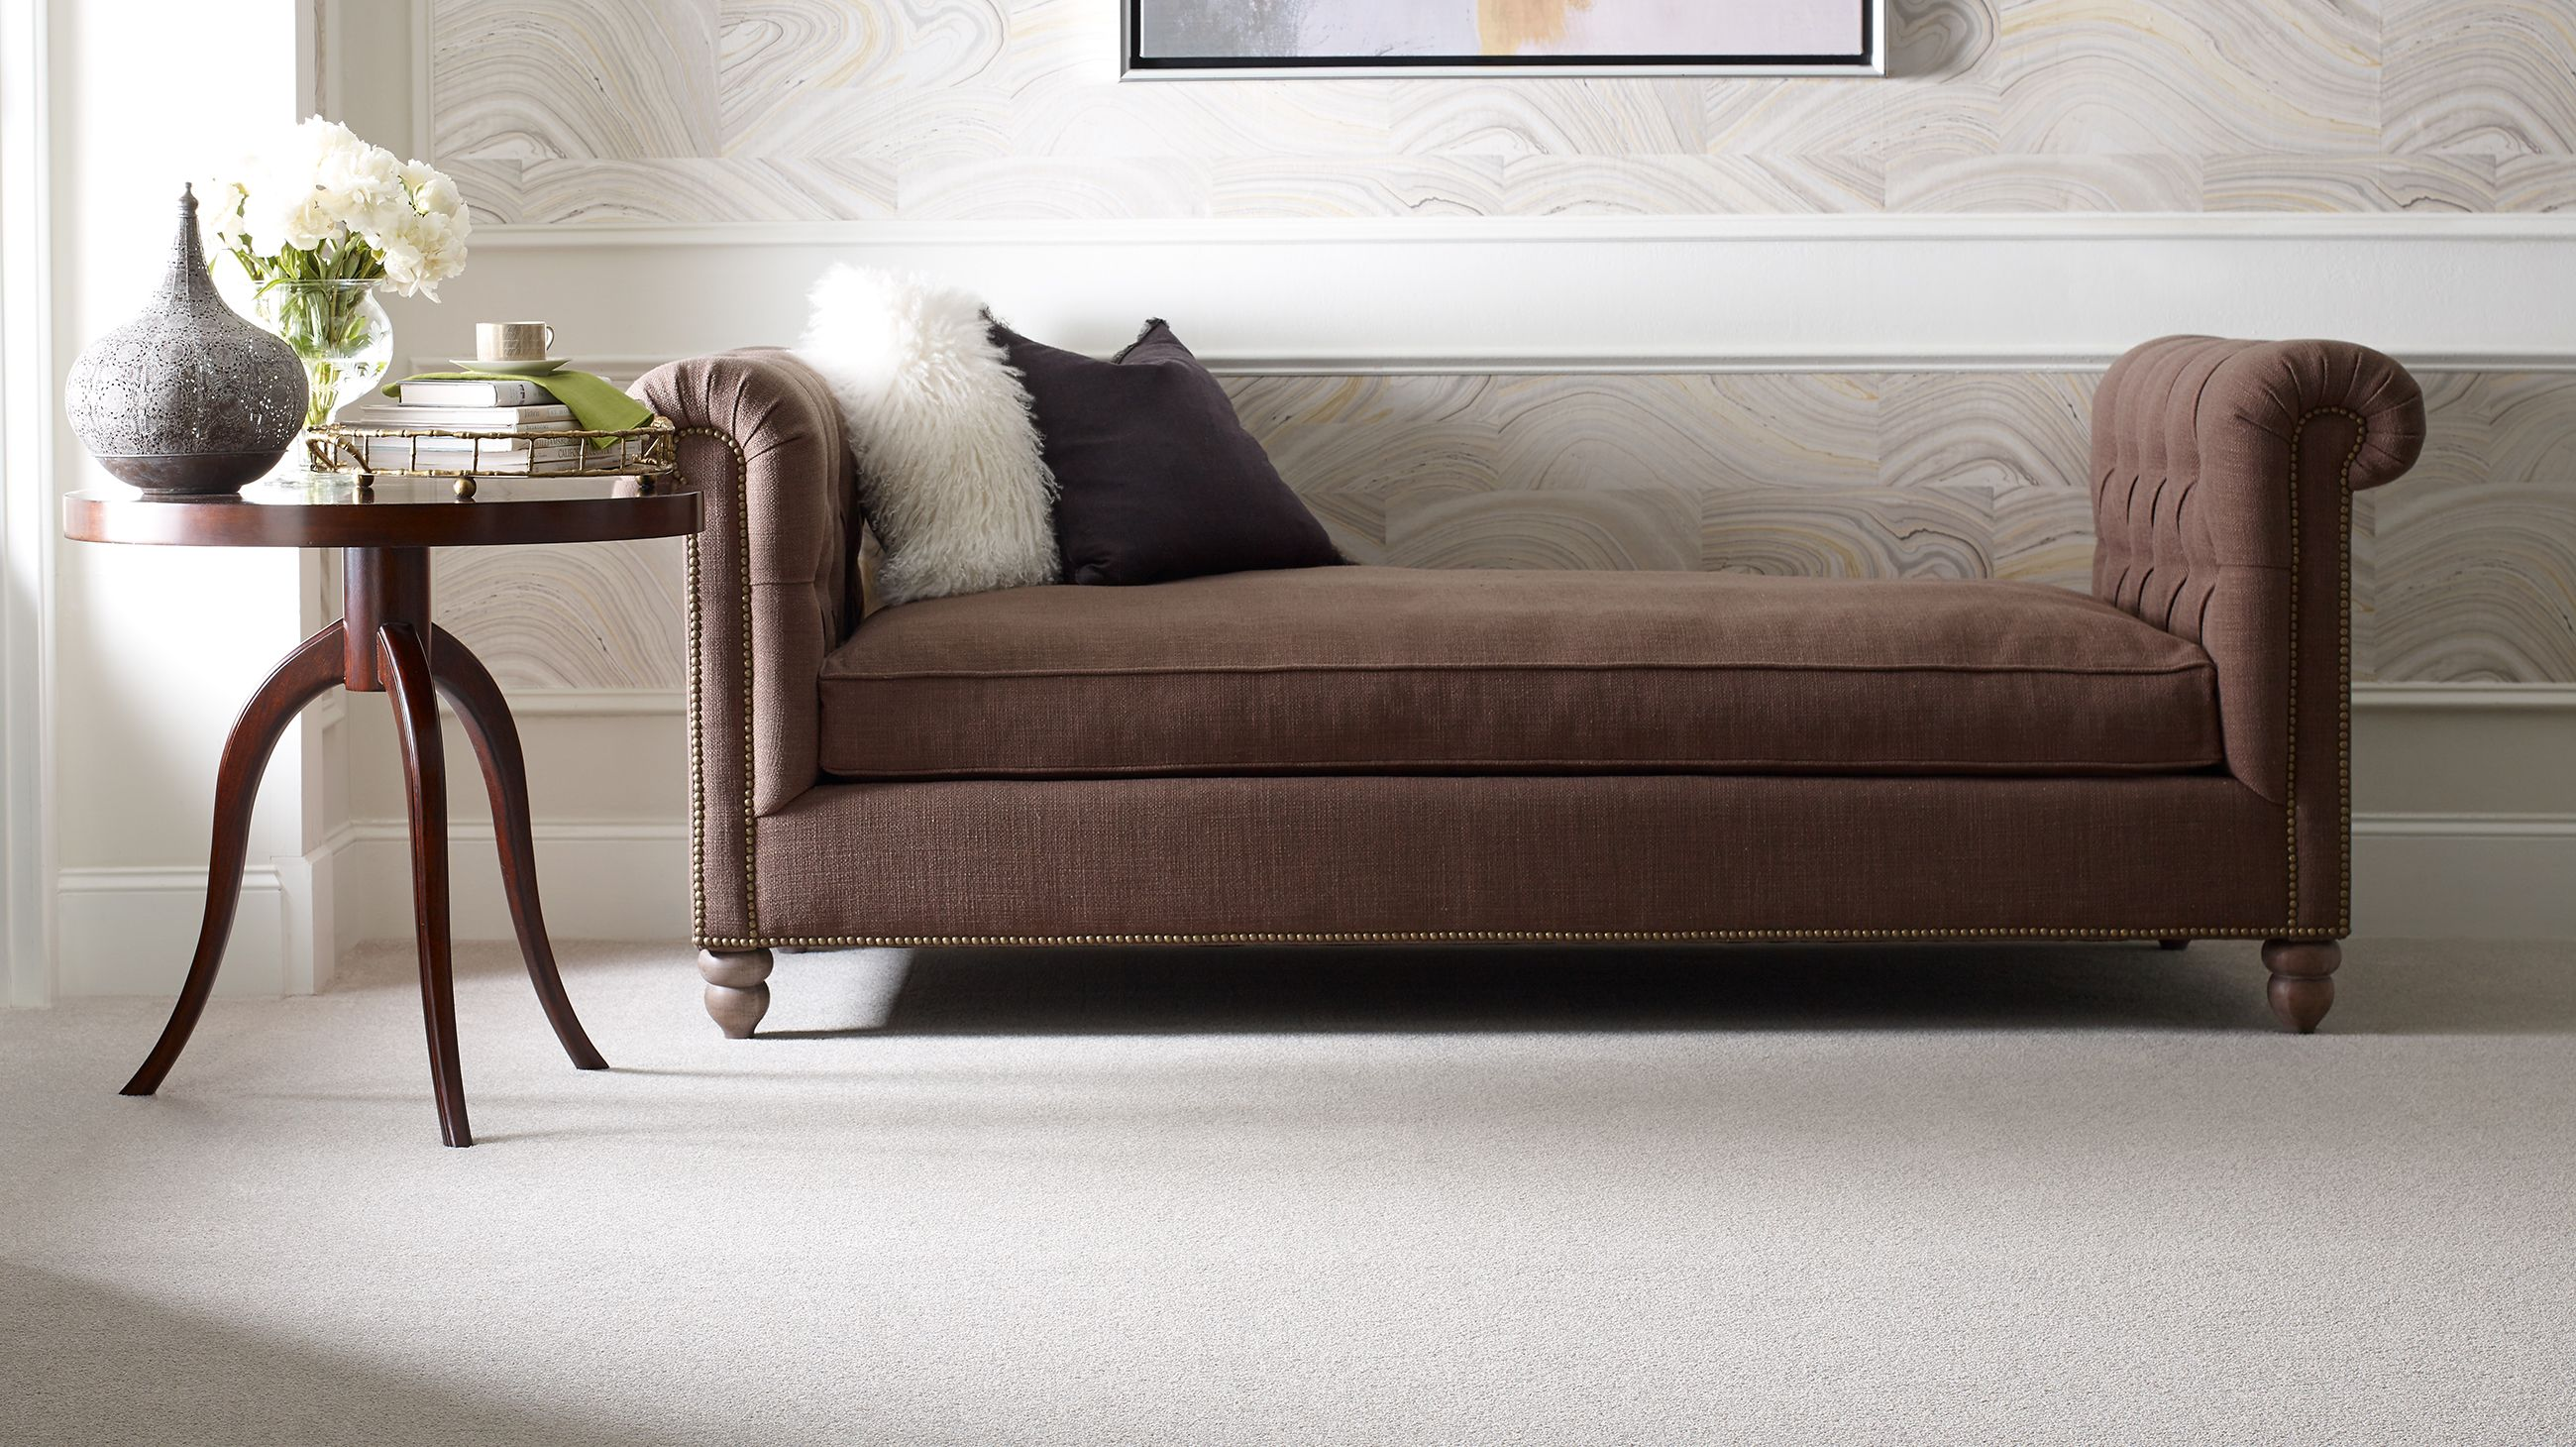 Carpet Stainmaster Karastan Mohawk G Fried Flooring